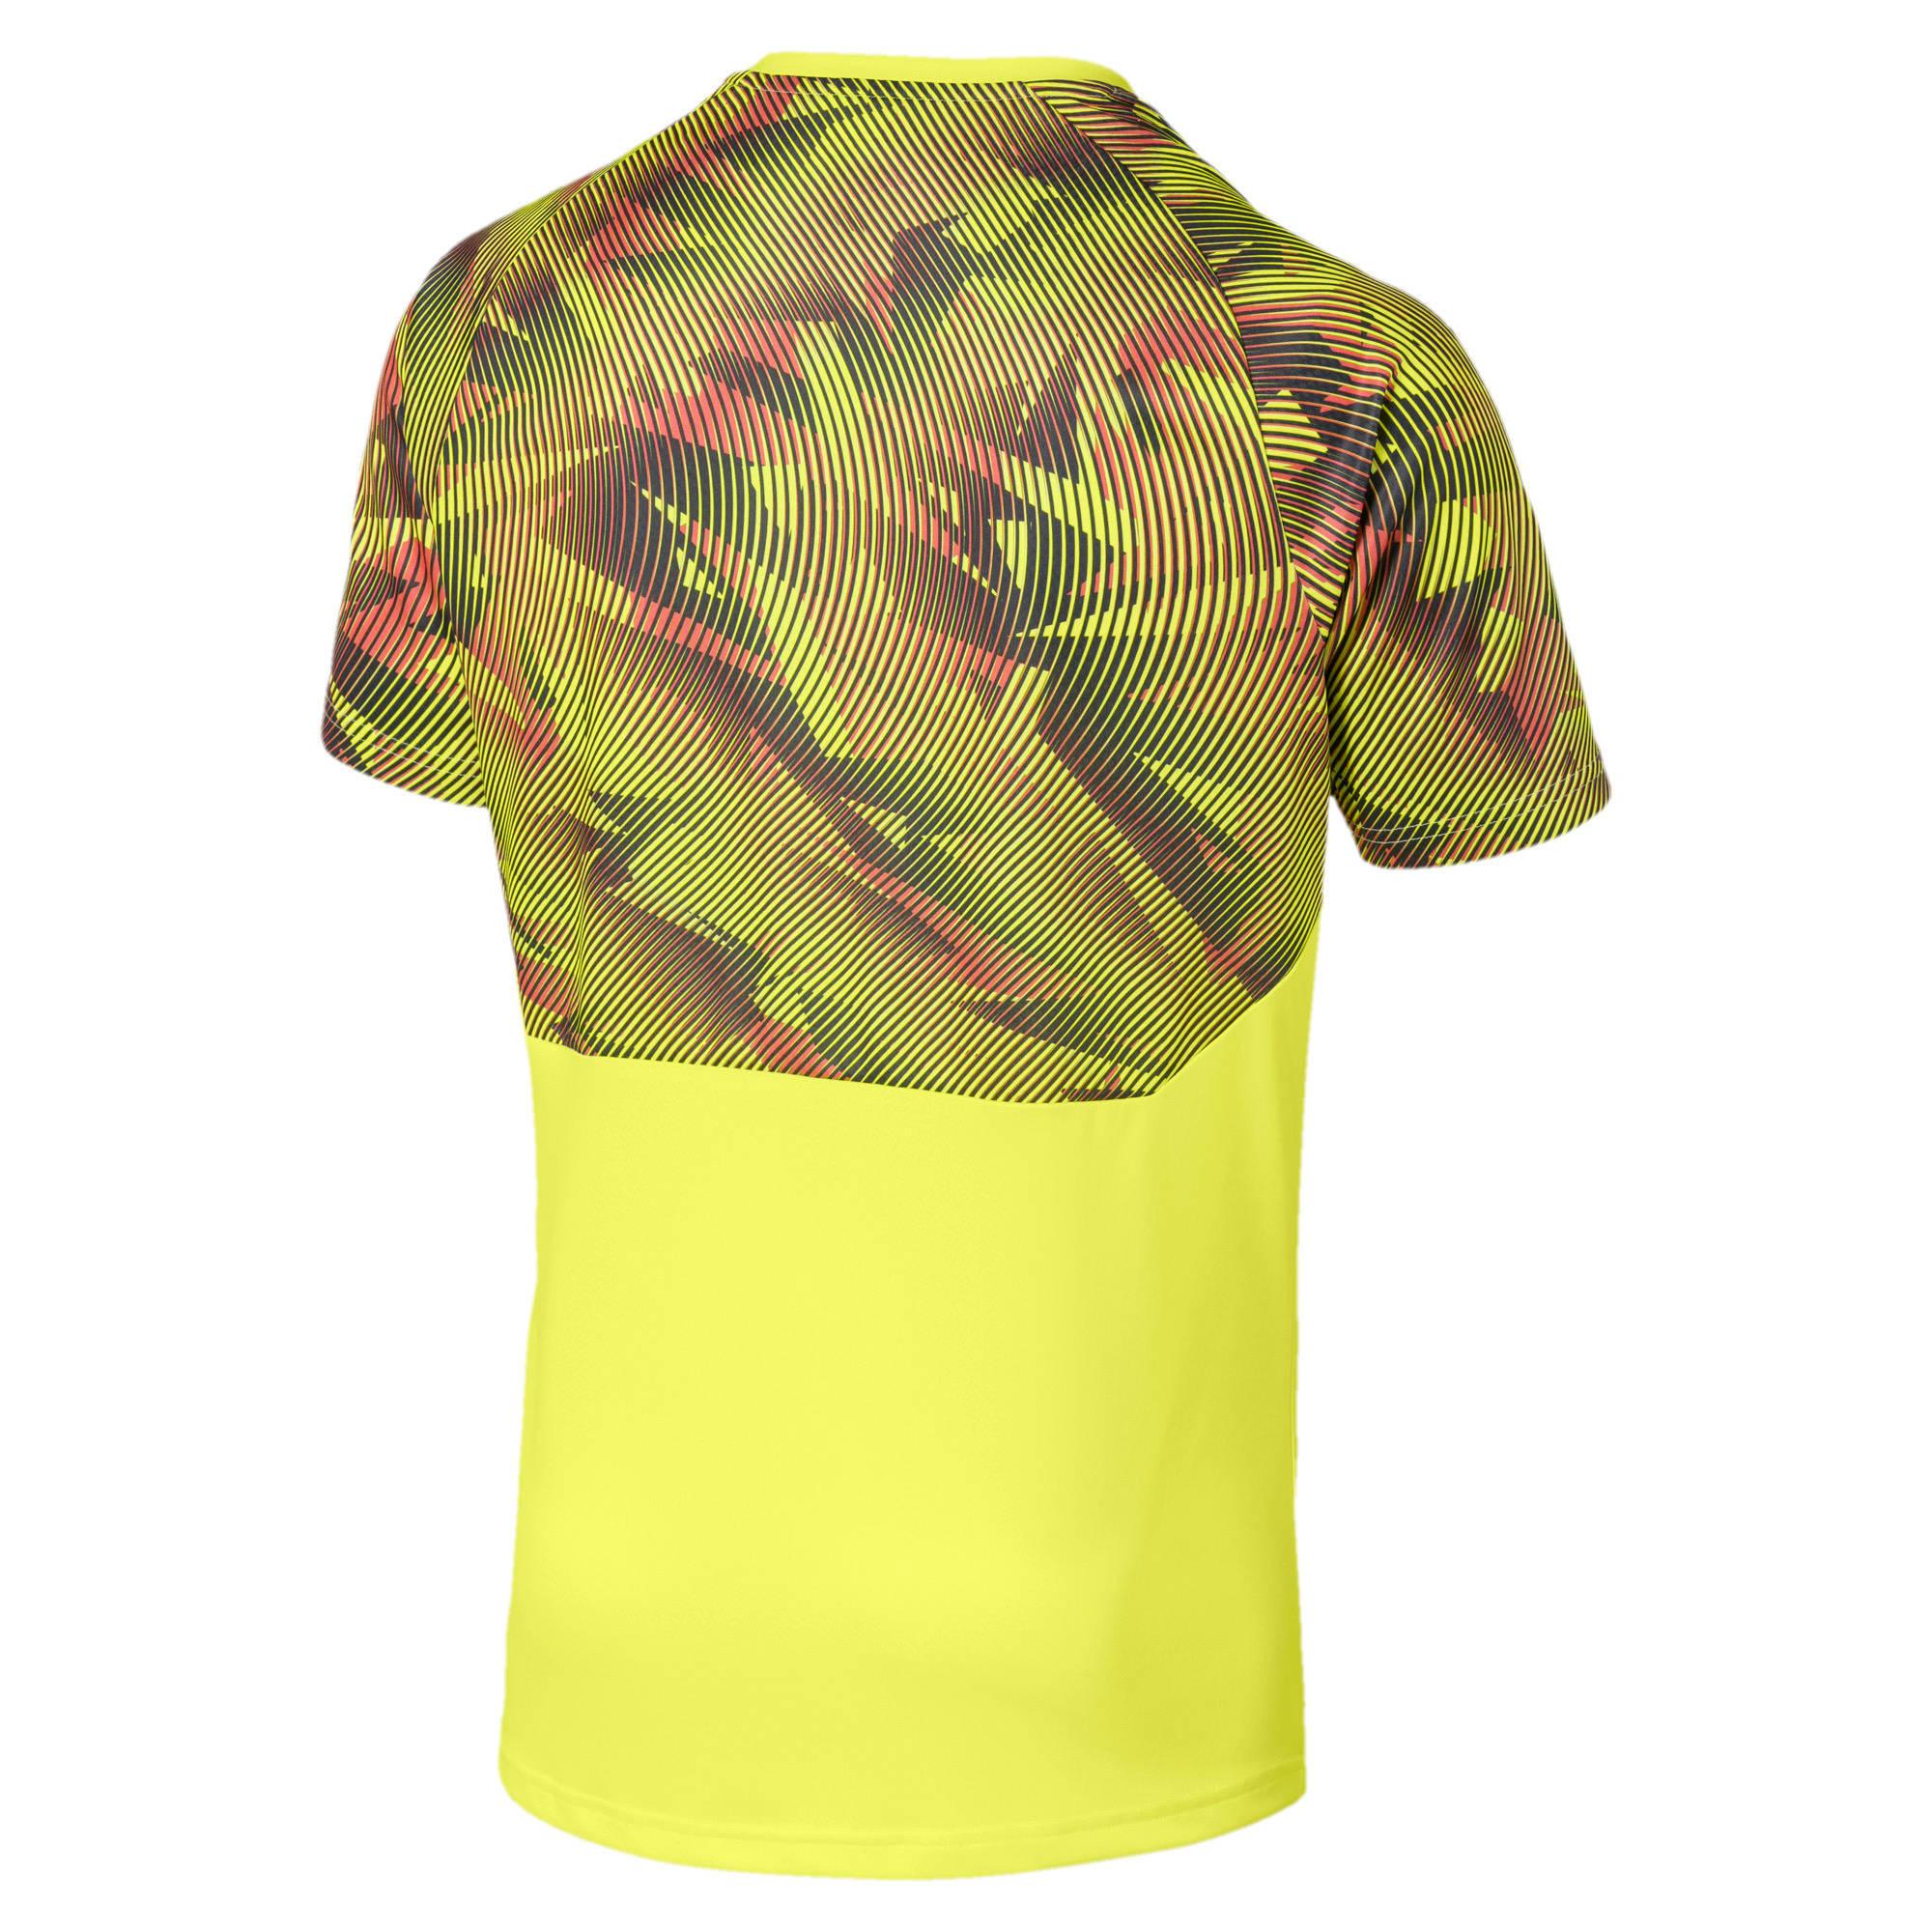 Imagen en miniatura 2 de Camiseta de training de hombre Man City, Fizzy Yellow-Asphalt, mediana